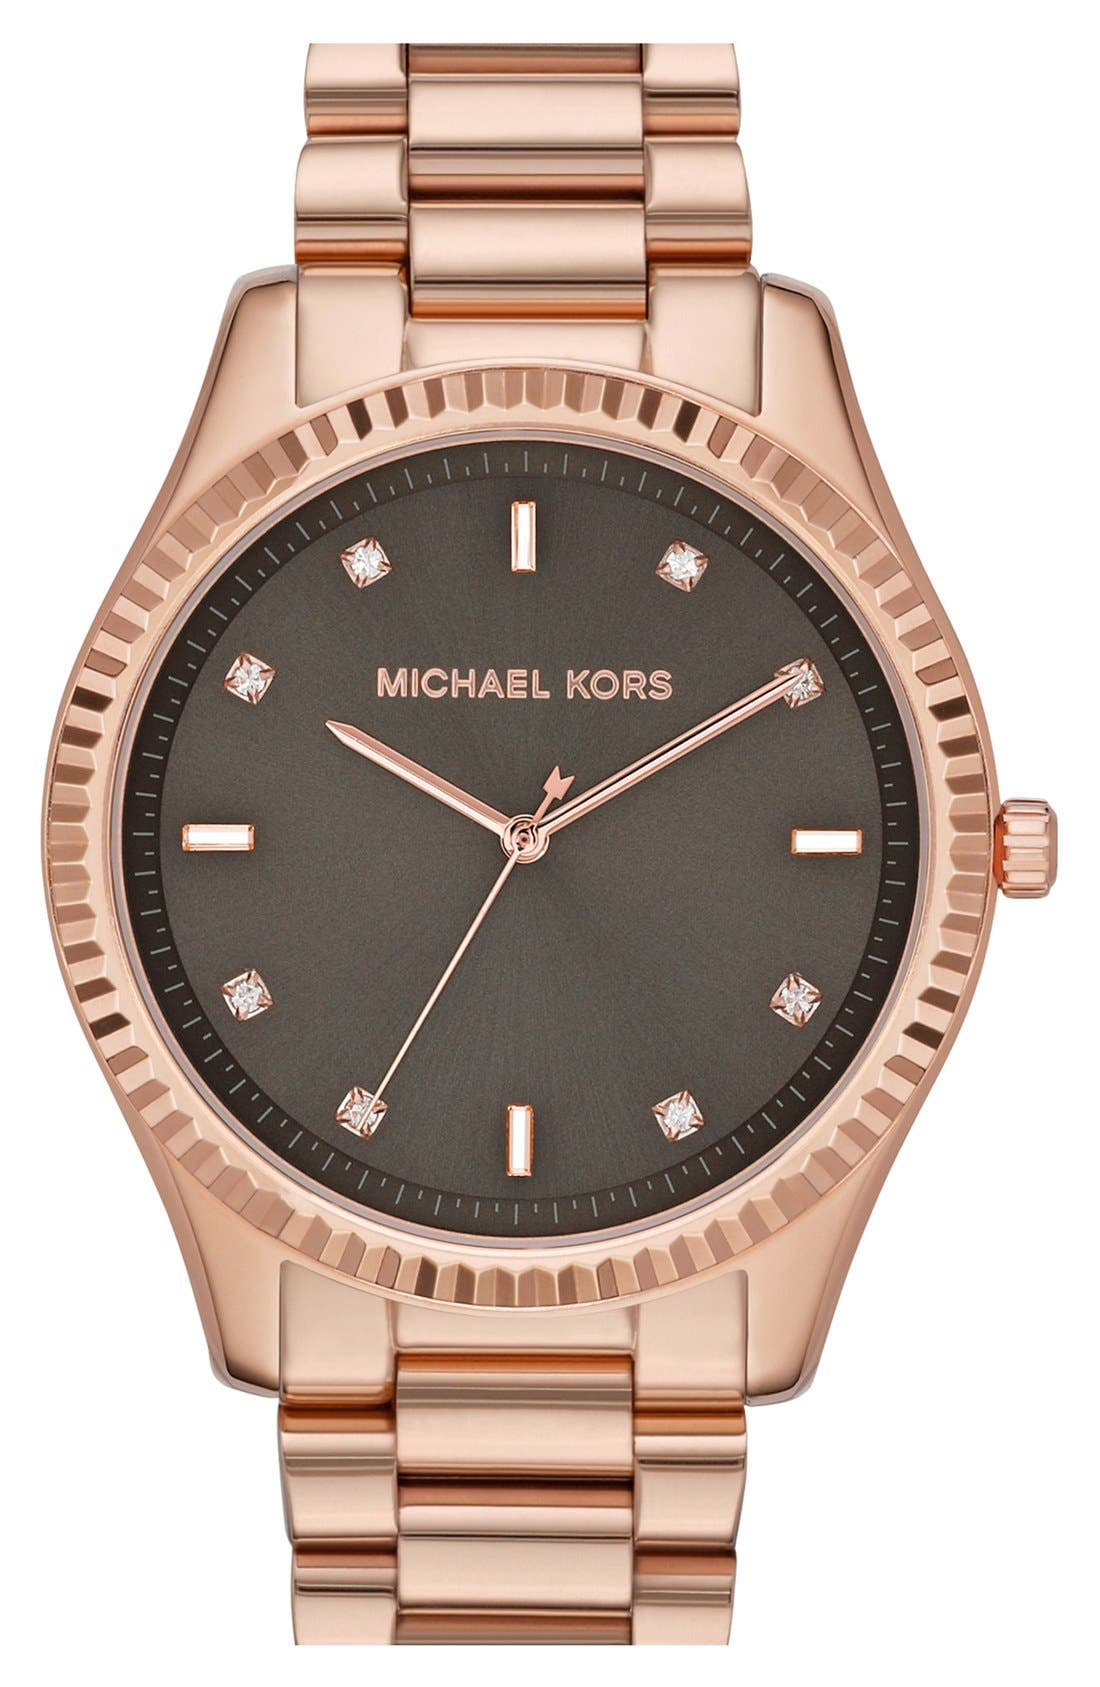 Main Image - Michael Kors 'Blake' Bracelet Watch, 42mm